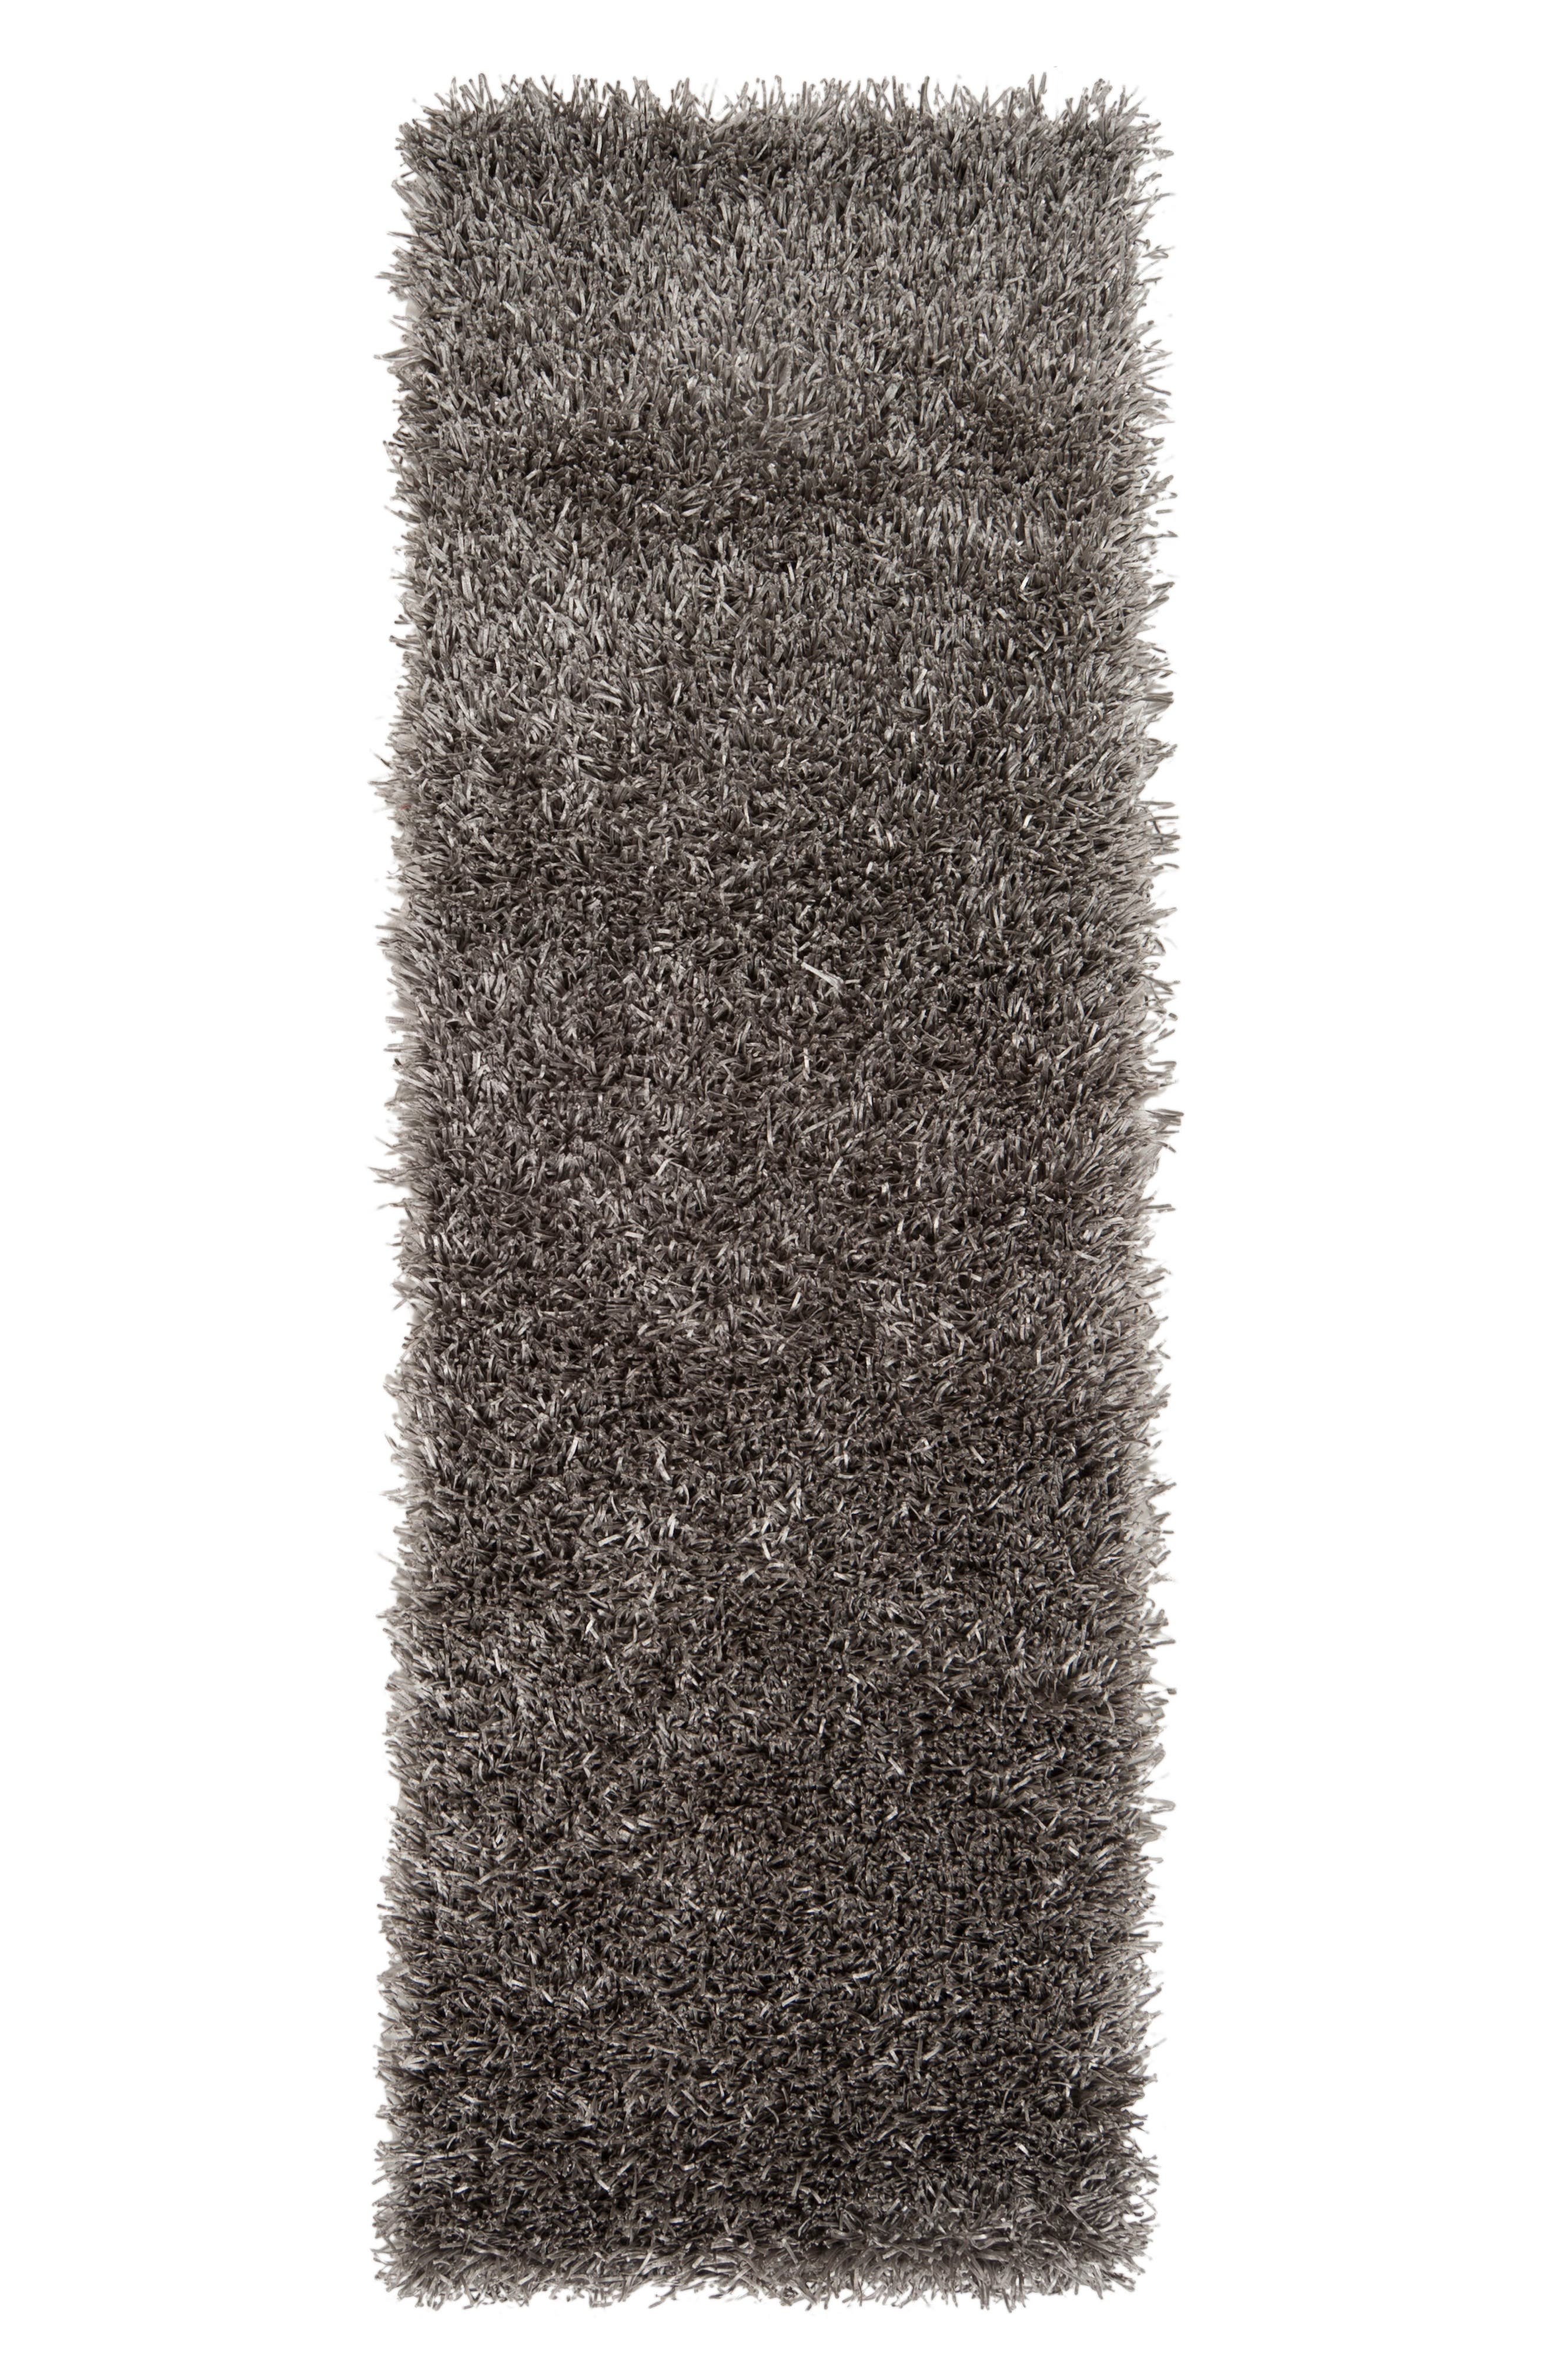 Shimmer Area Rug,                             Main thumbnail 1, color,